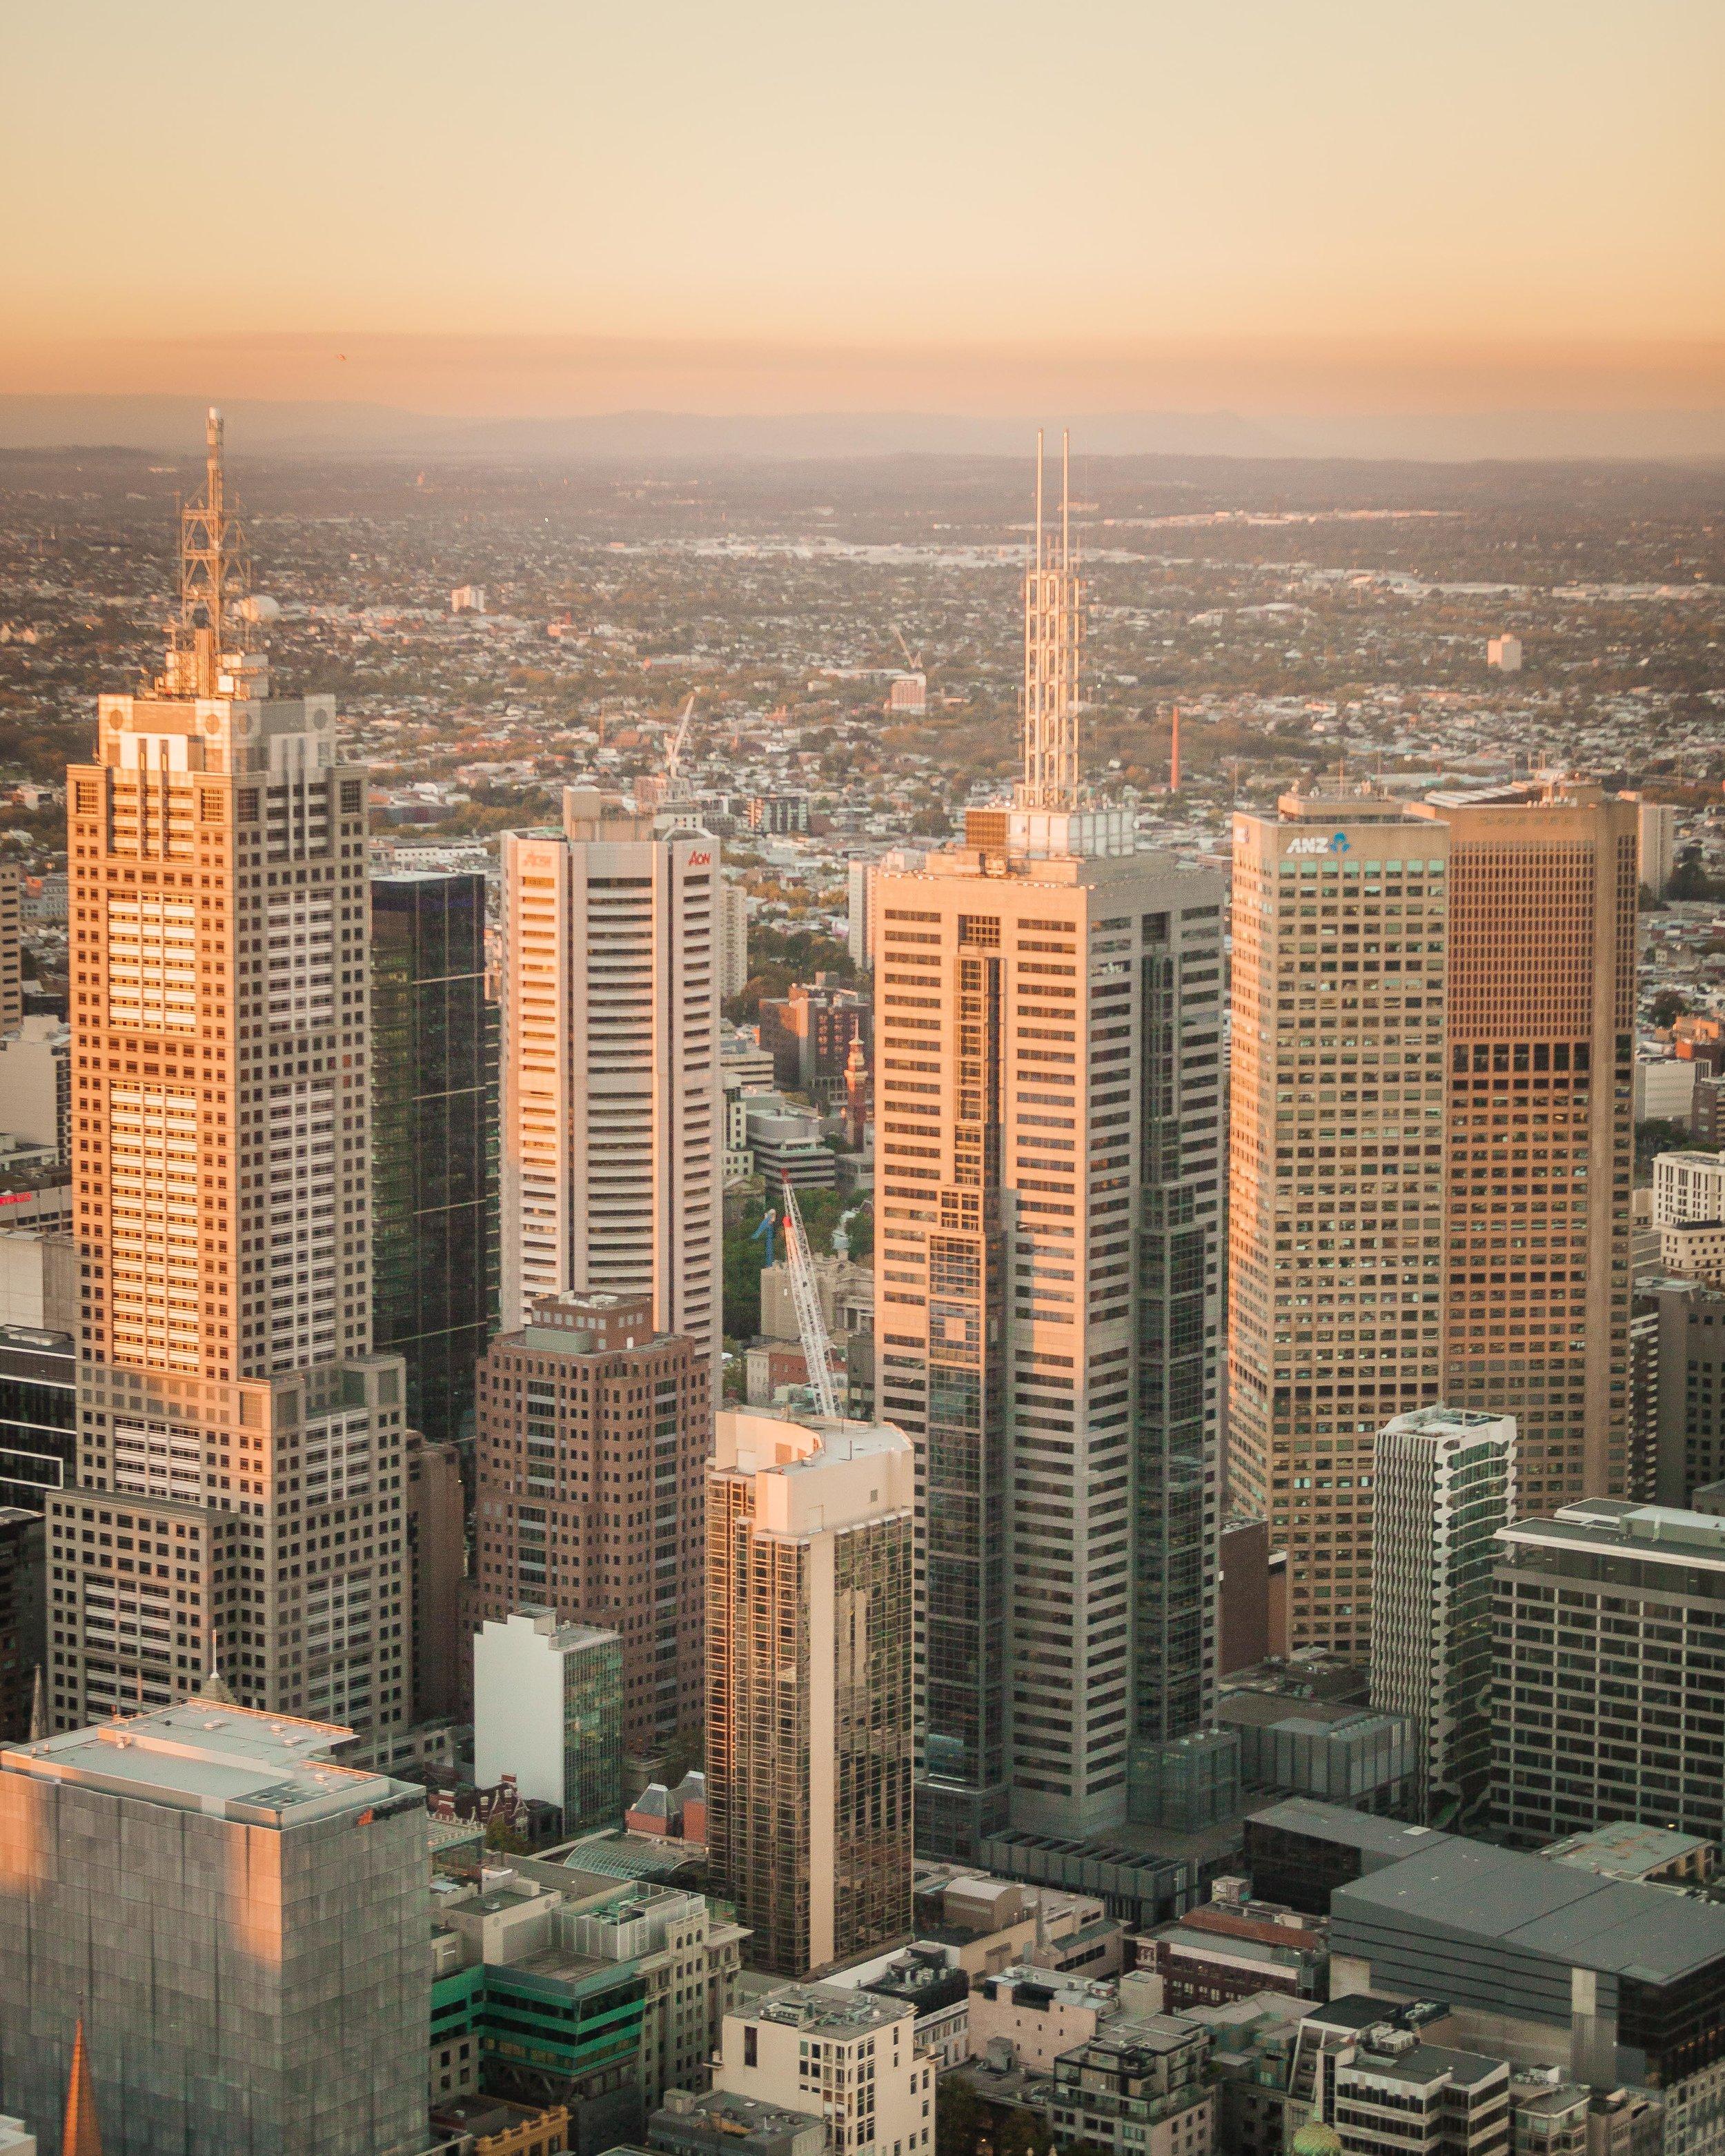 Melbourne Urban City-5566-3.jpg